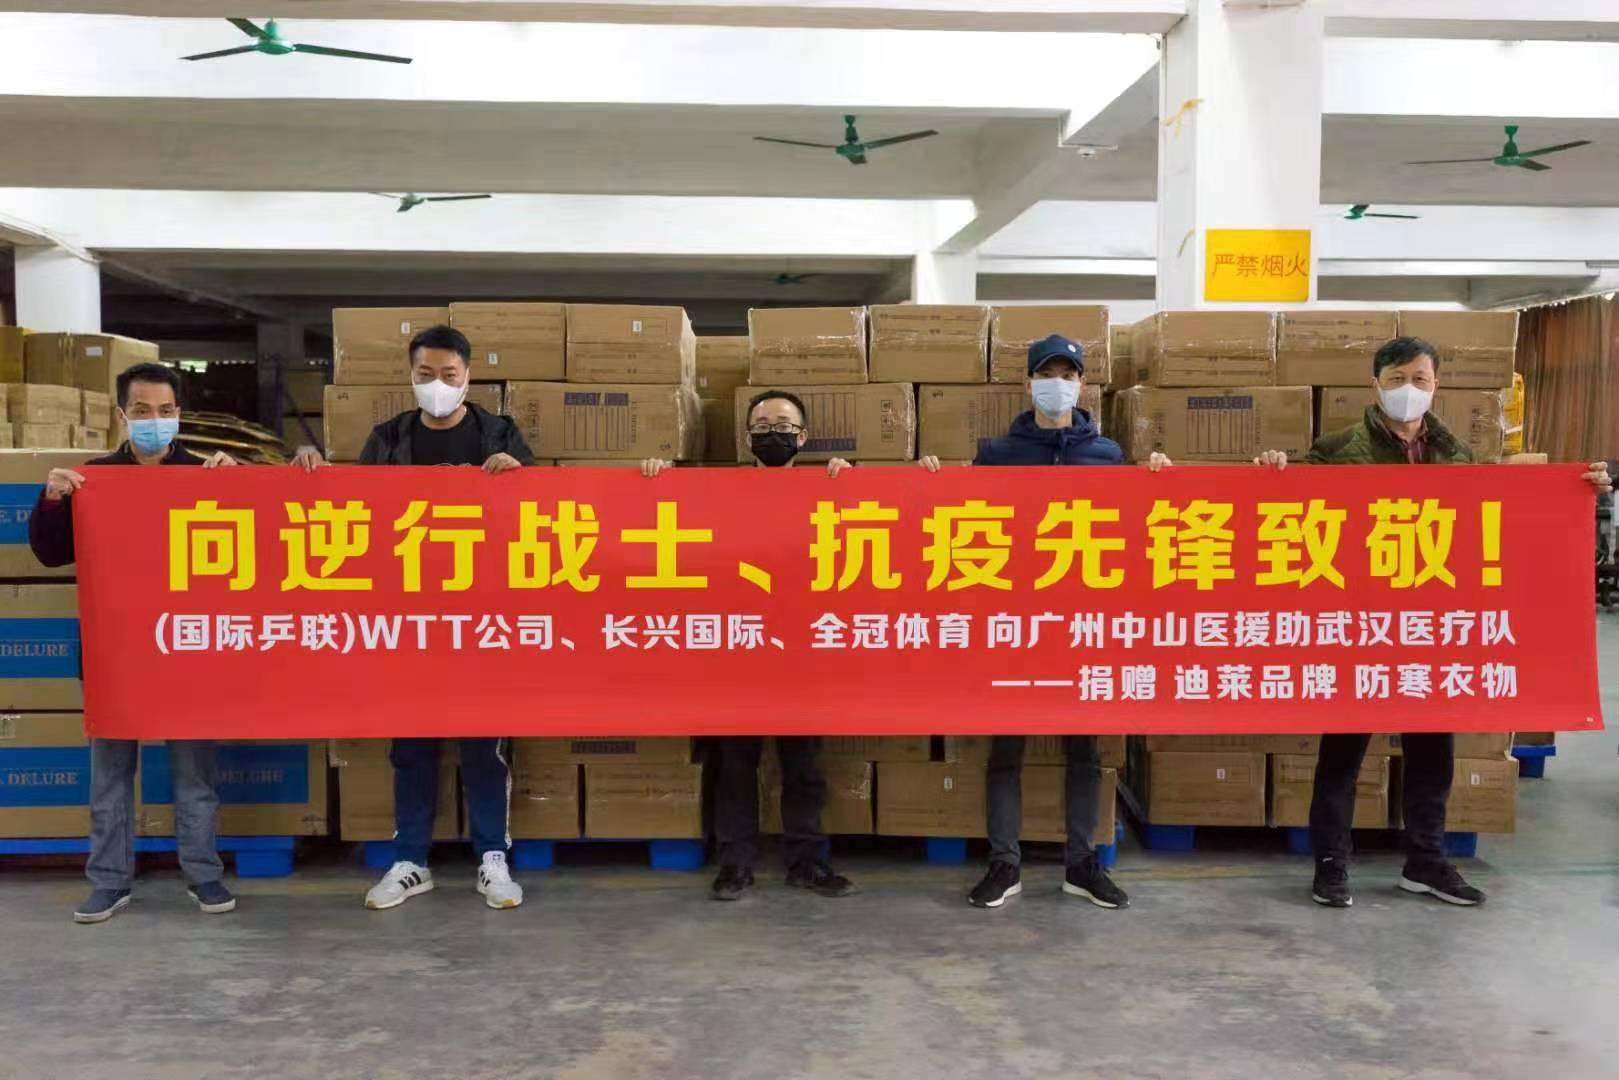 ITTF supply masks and warm clothing to Wuhan to help coronavirus battle